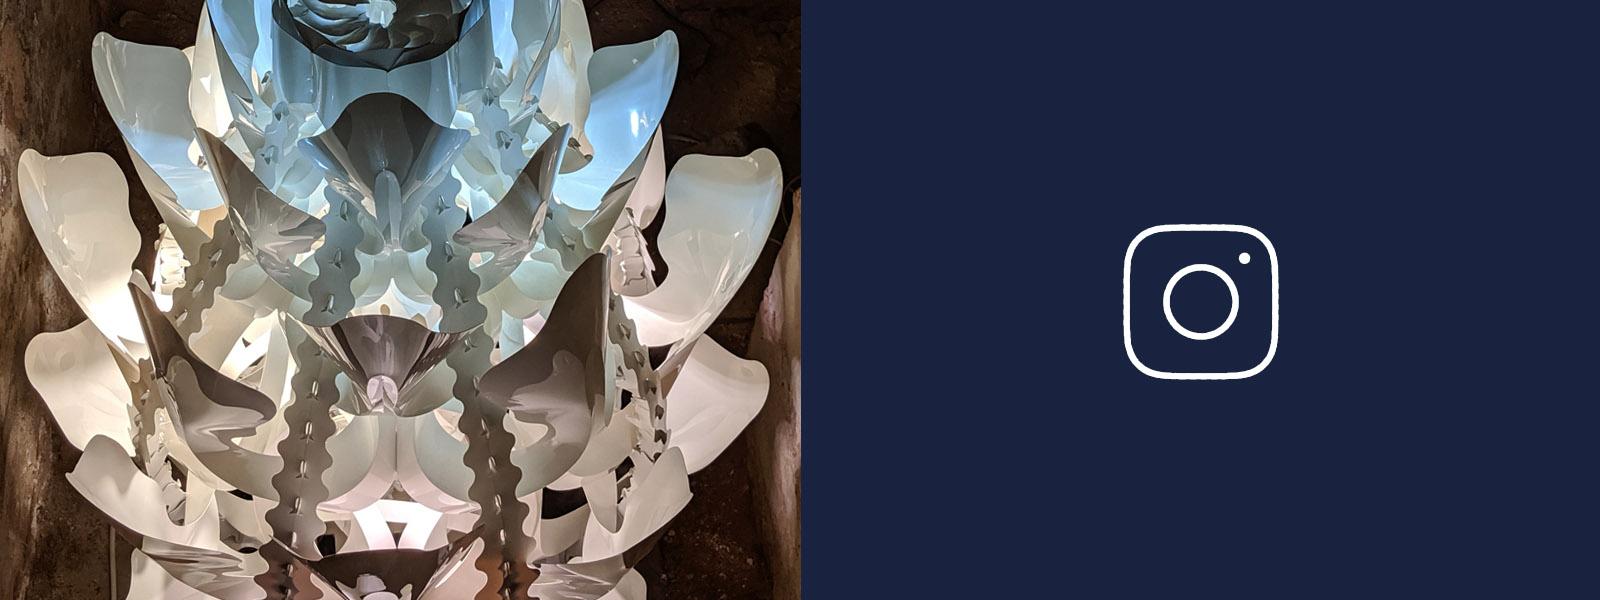 barry magazinovic lighting chandelier instagram design art creative Australian